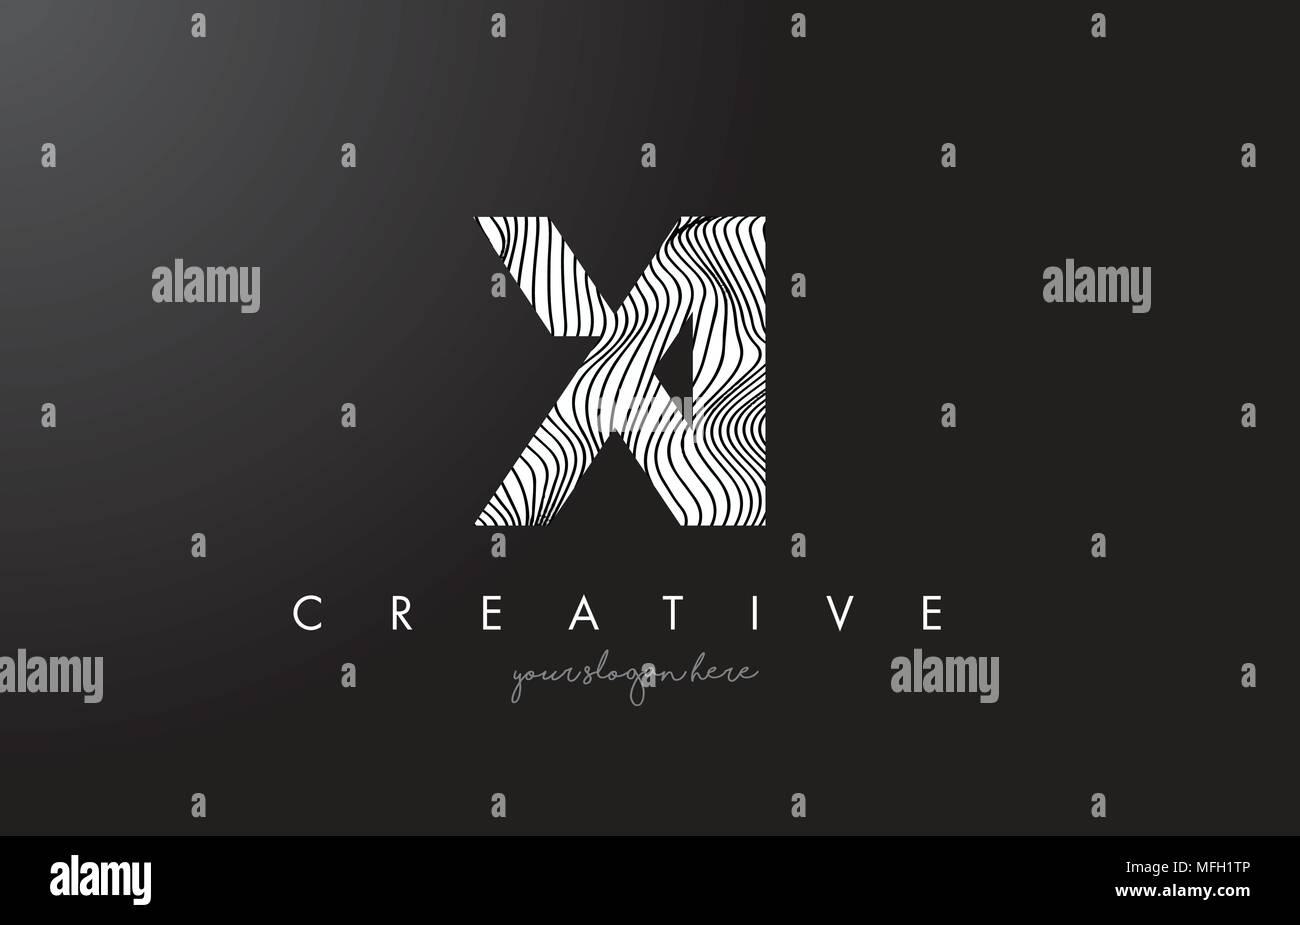 XI X I Letter Logo with Zebra Lines Texture Design Vector Illustration. - Stock Vector